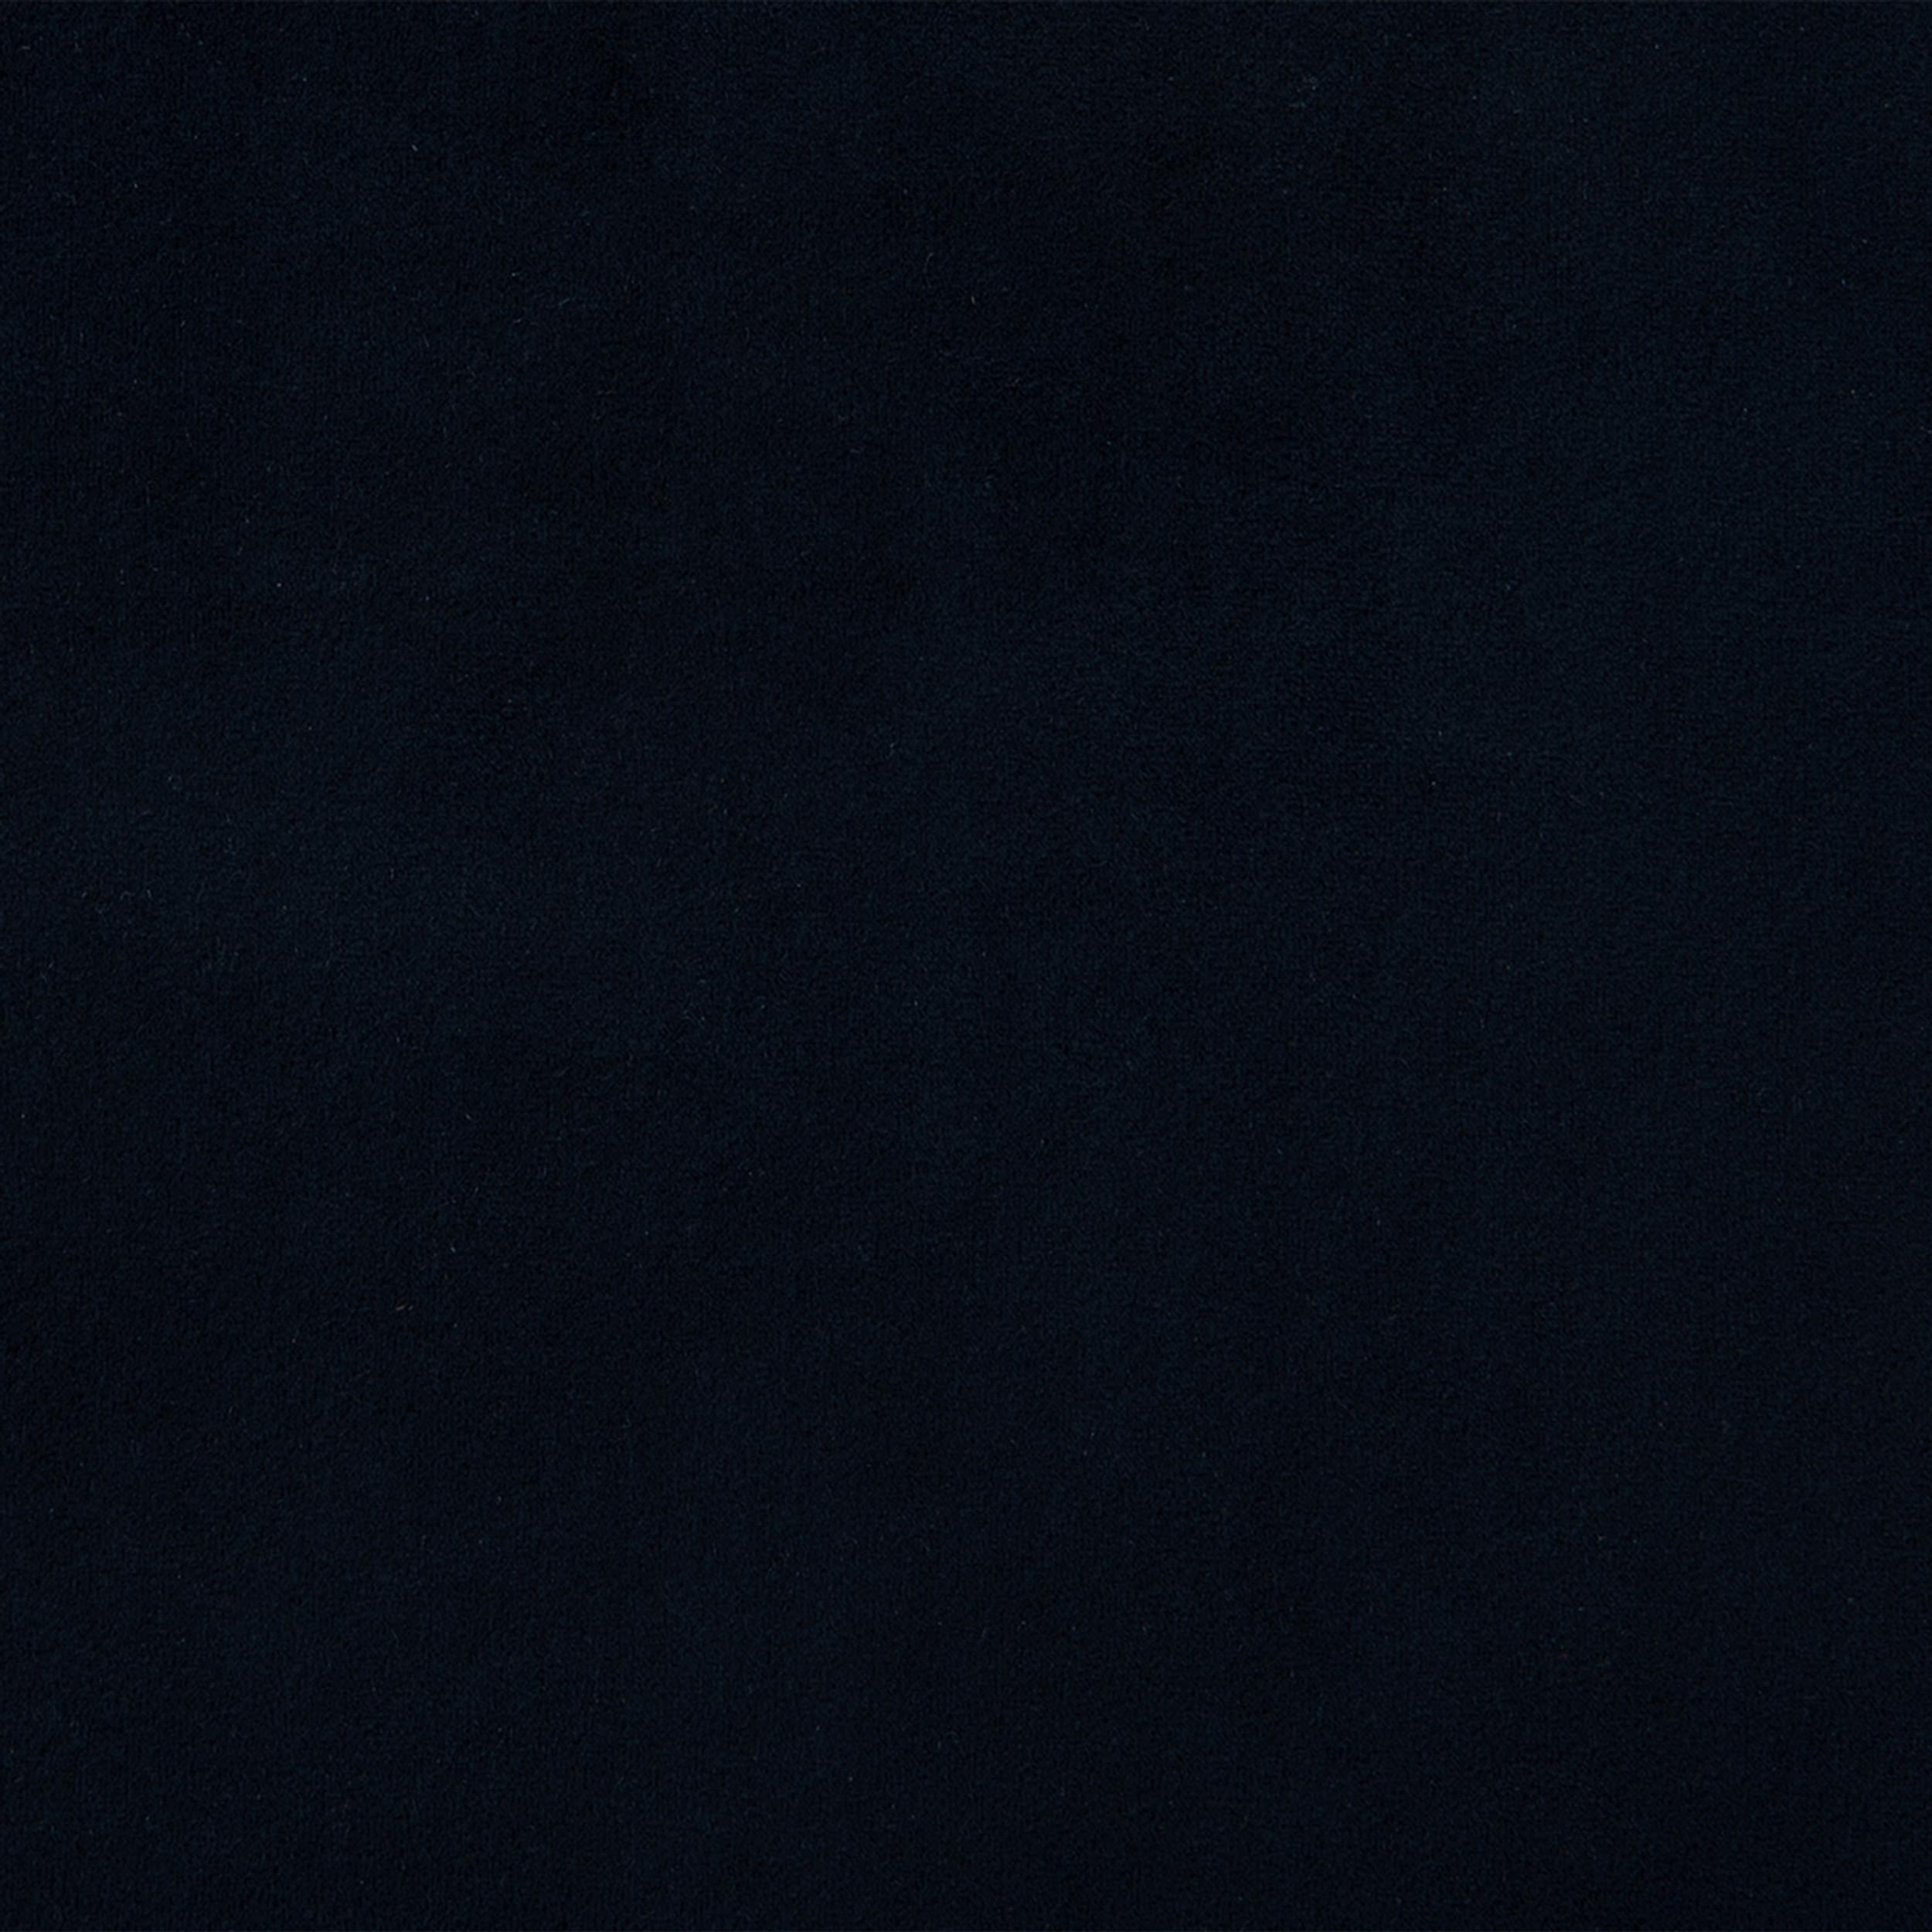 Dark Navy Blue : 872 Swatch - Jennifer Taylor Home